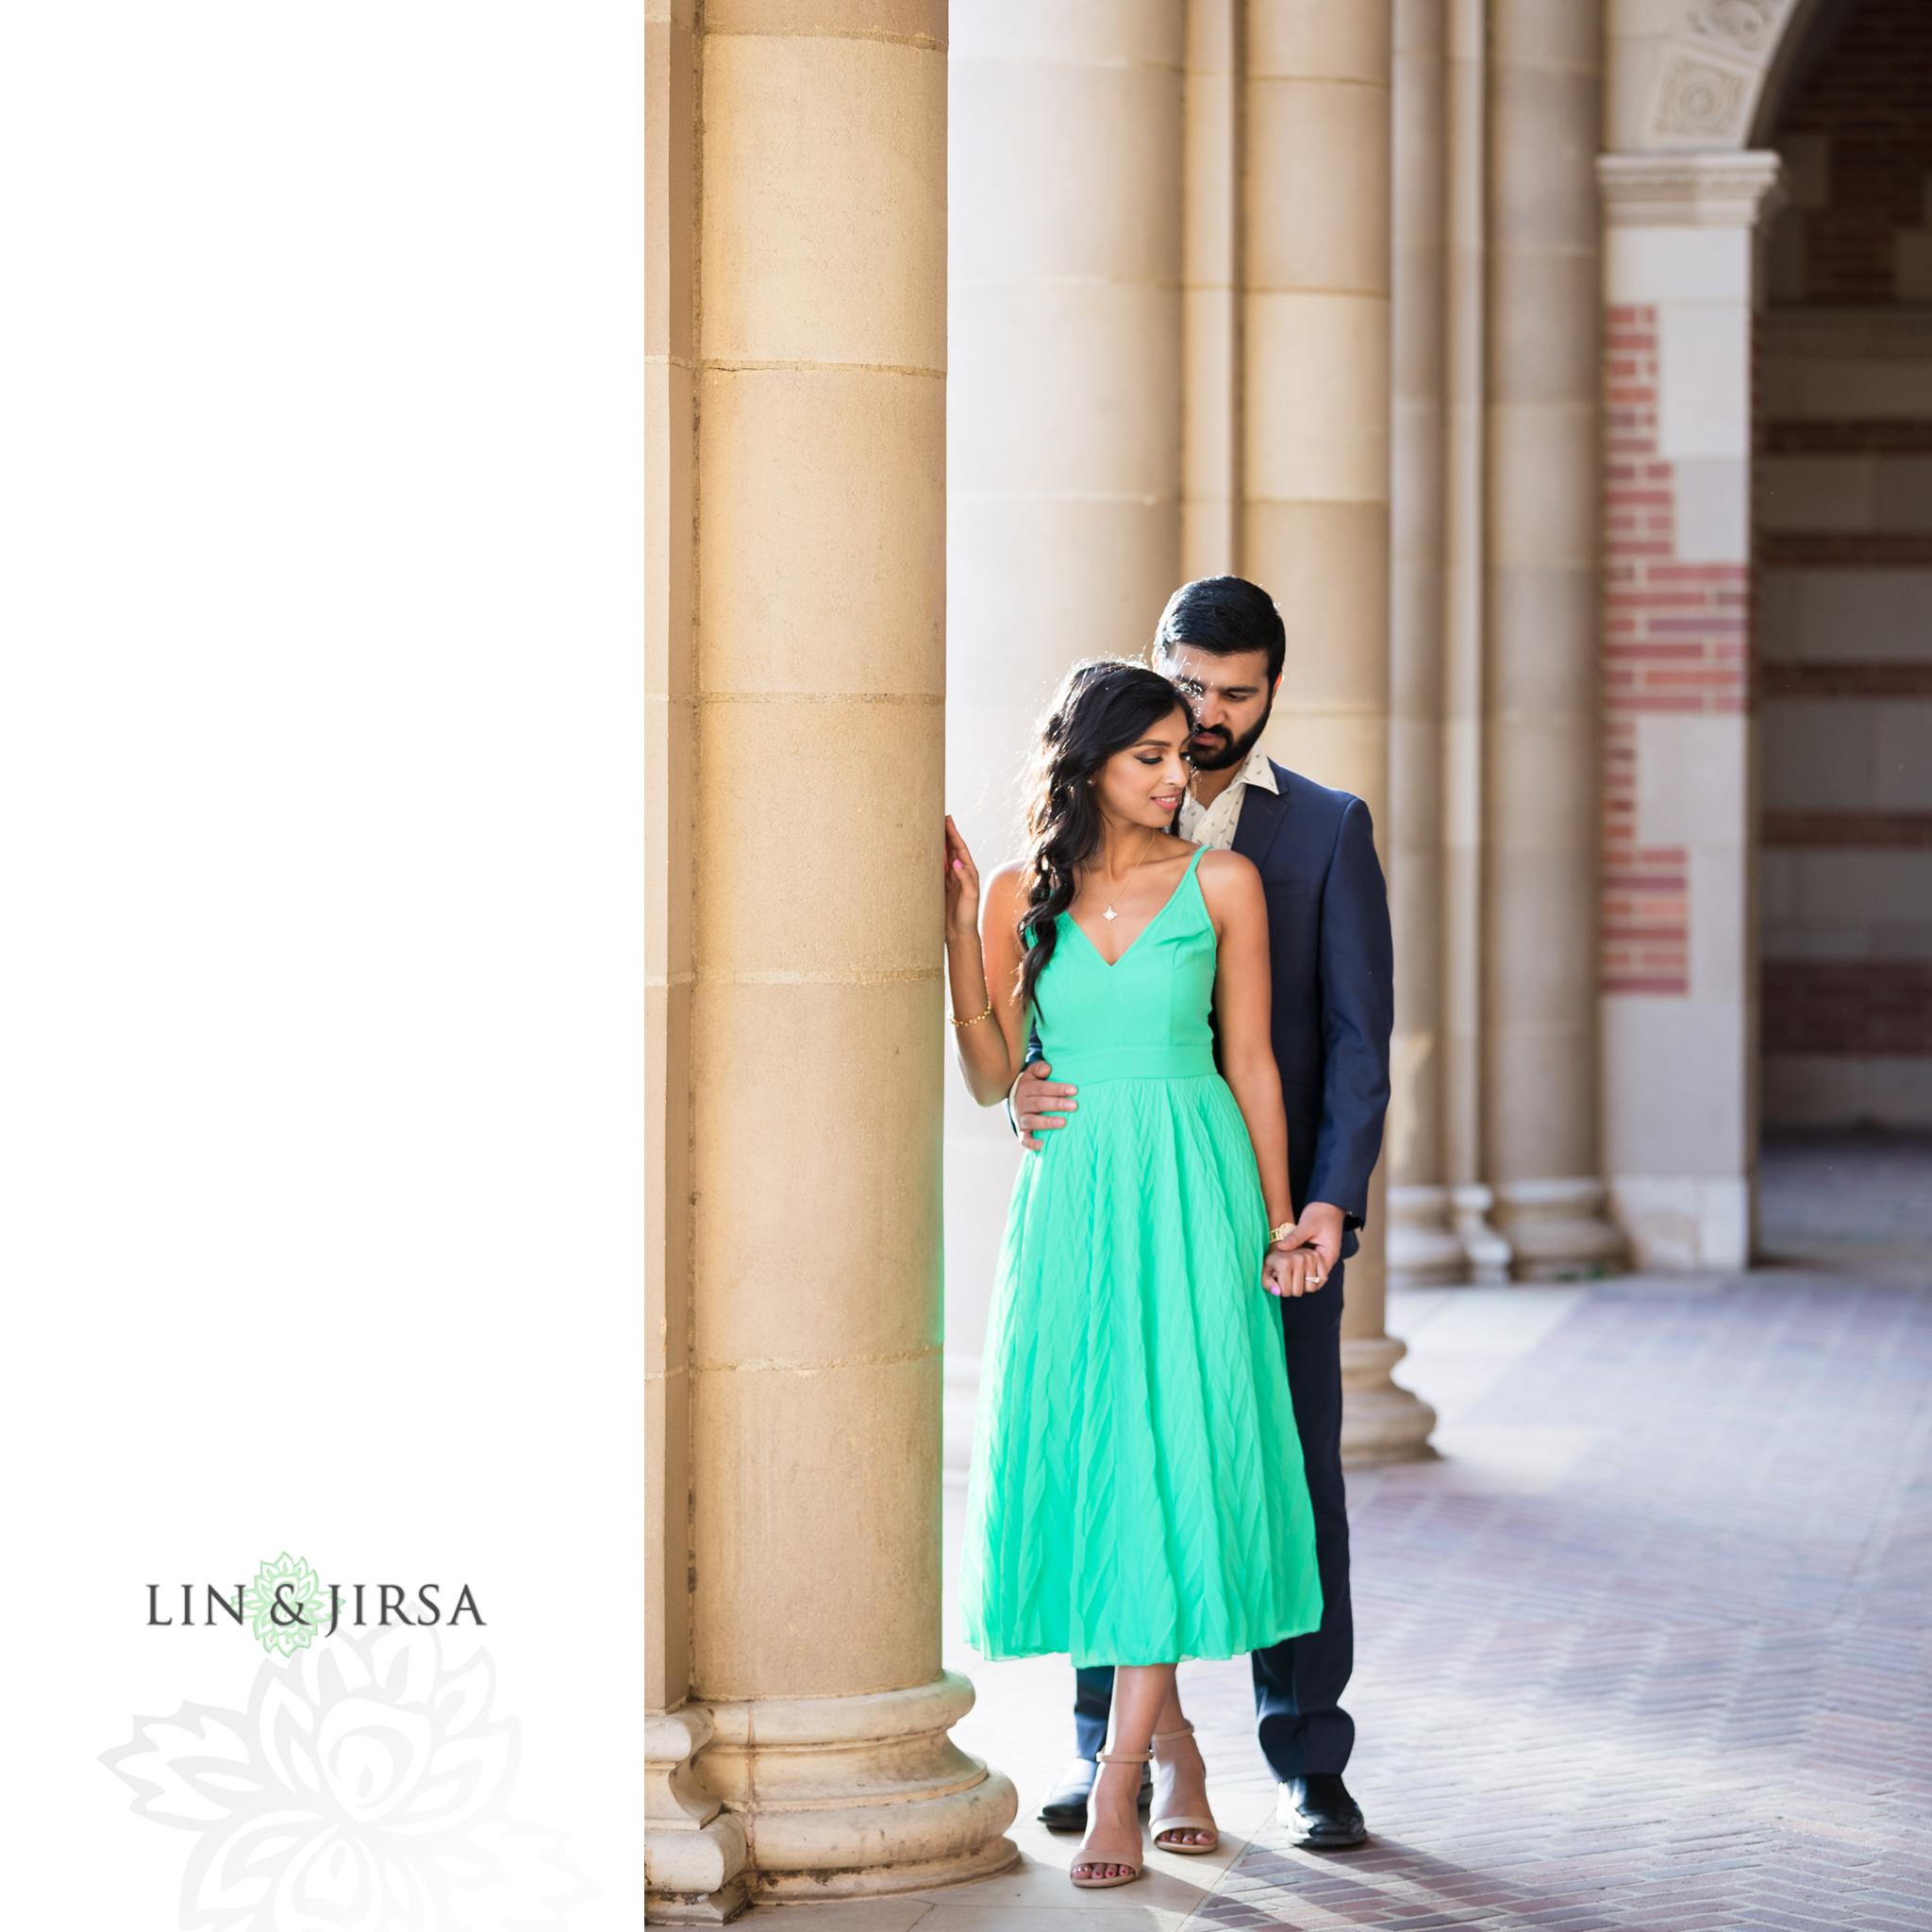 09-UCLA-Los-Angeles-Engagement-Photography